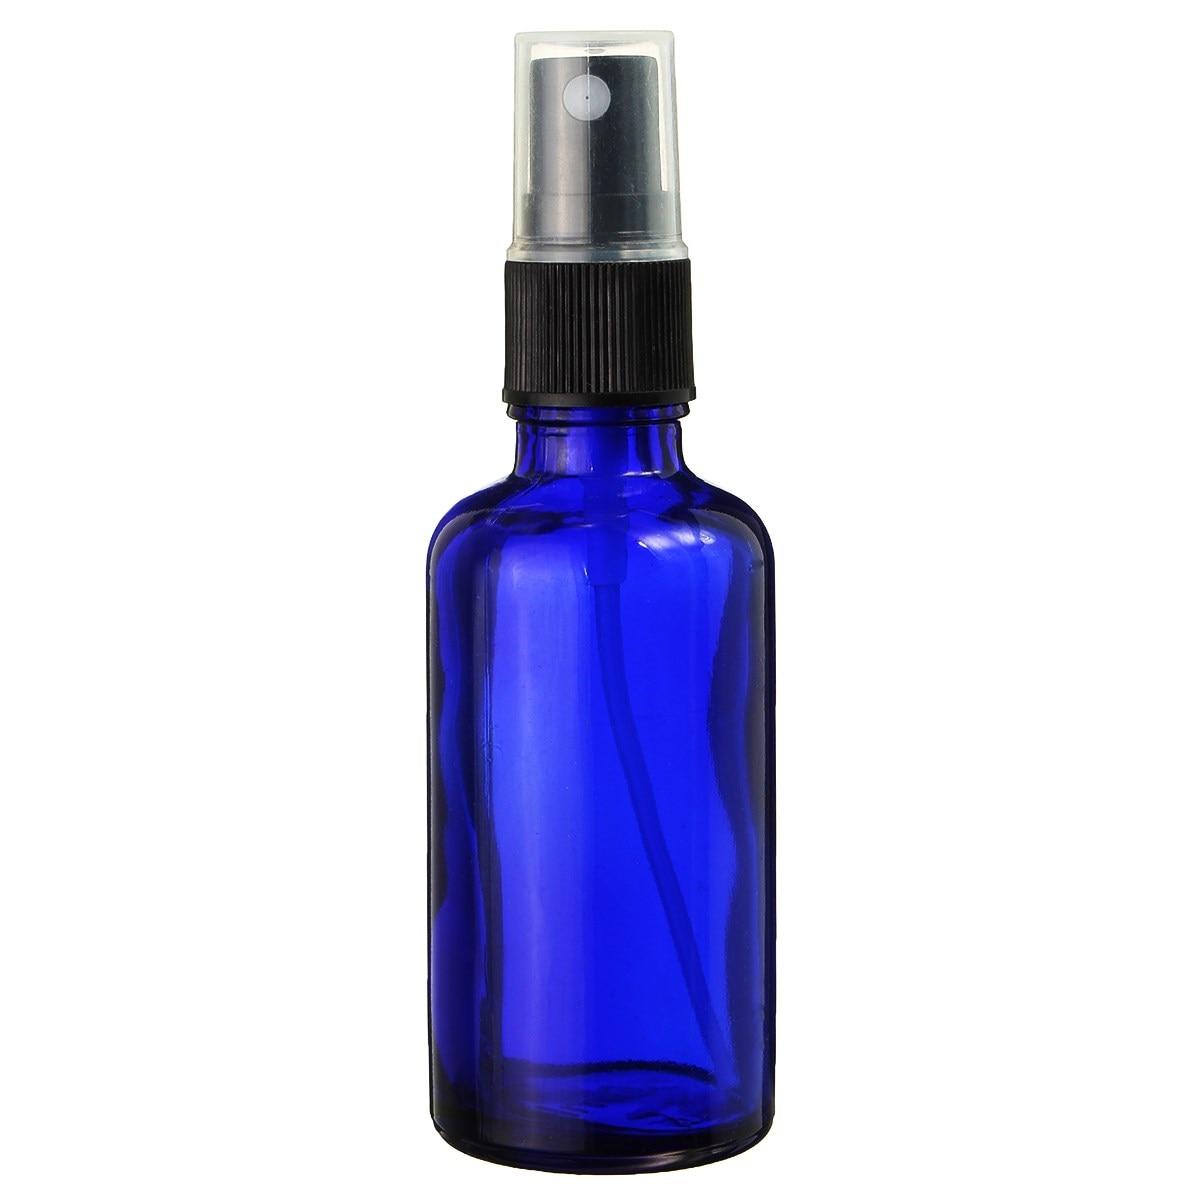 1pcs 50ml Blue Empty Glass Spray Bottle Glass Sprayer Bottles